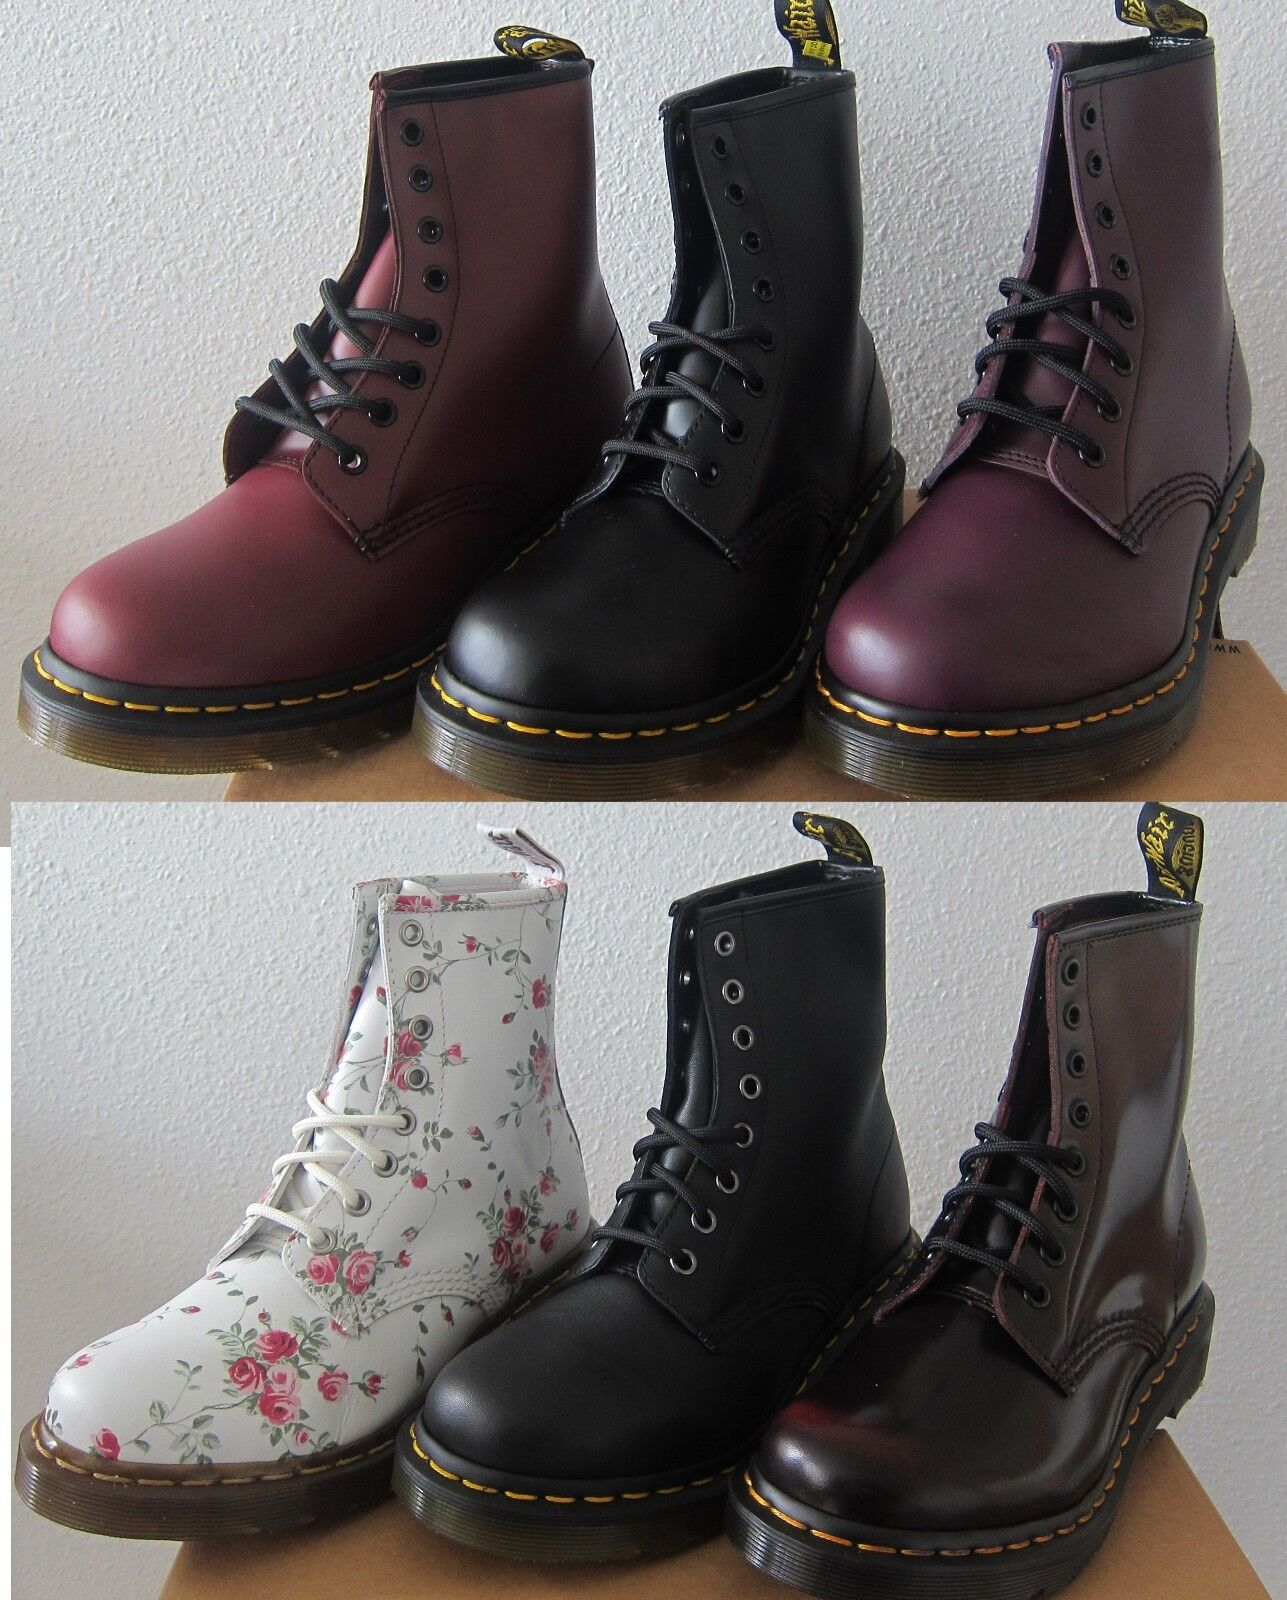 NEW  Women's DOC Dr. Martens 1460 Originals 8 Eye Lace Up Boots -Assorted colors